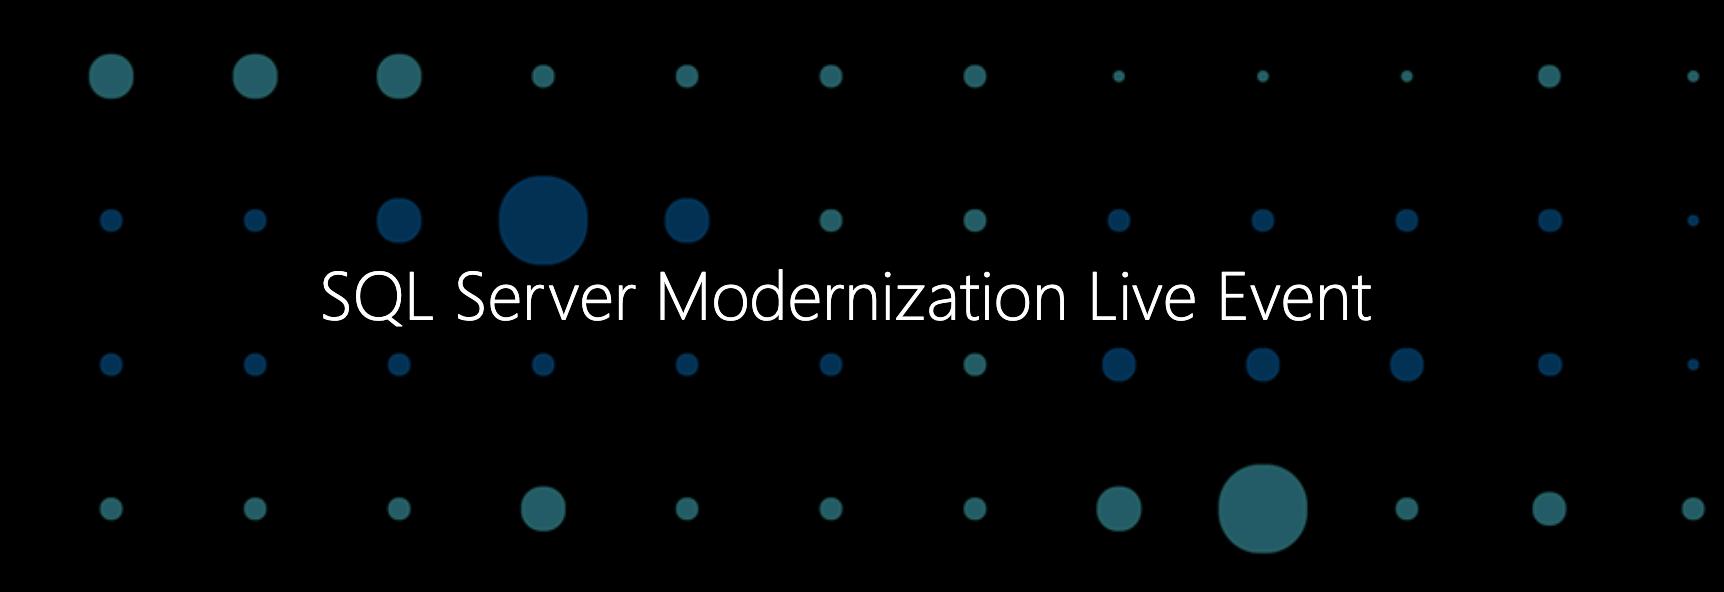 Microsoft Azure SQL Server Modernization Live Event